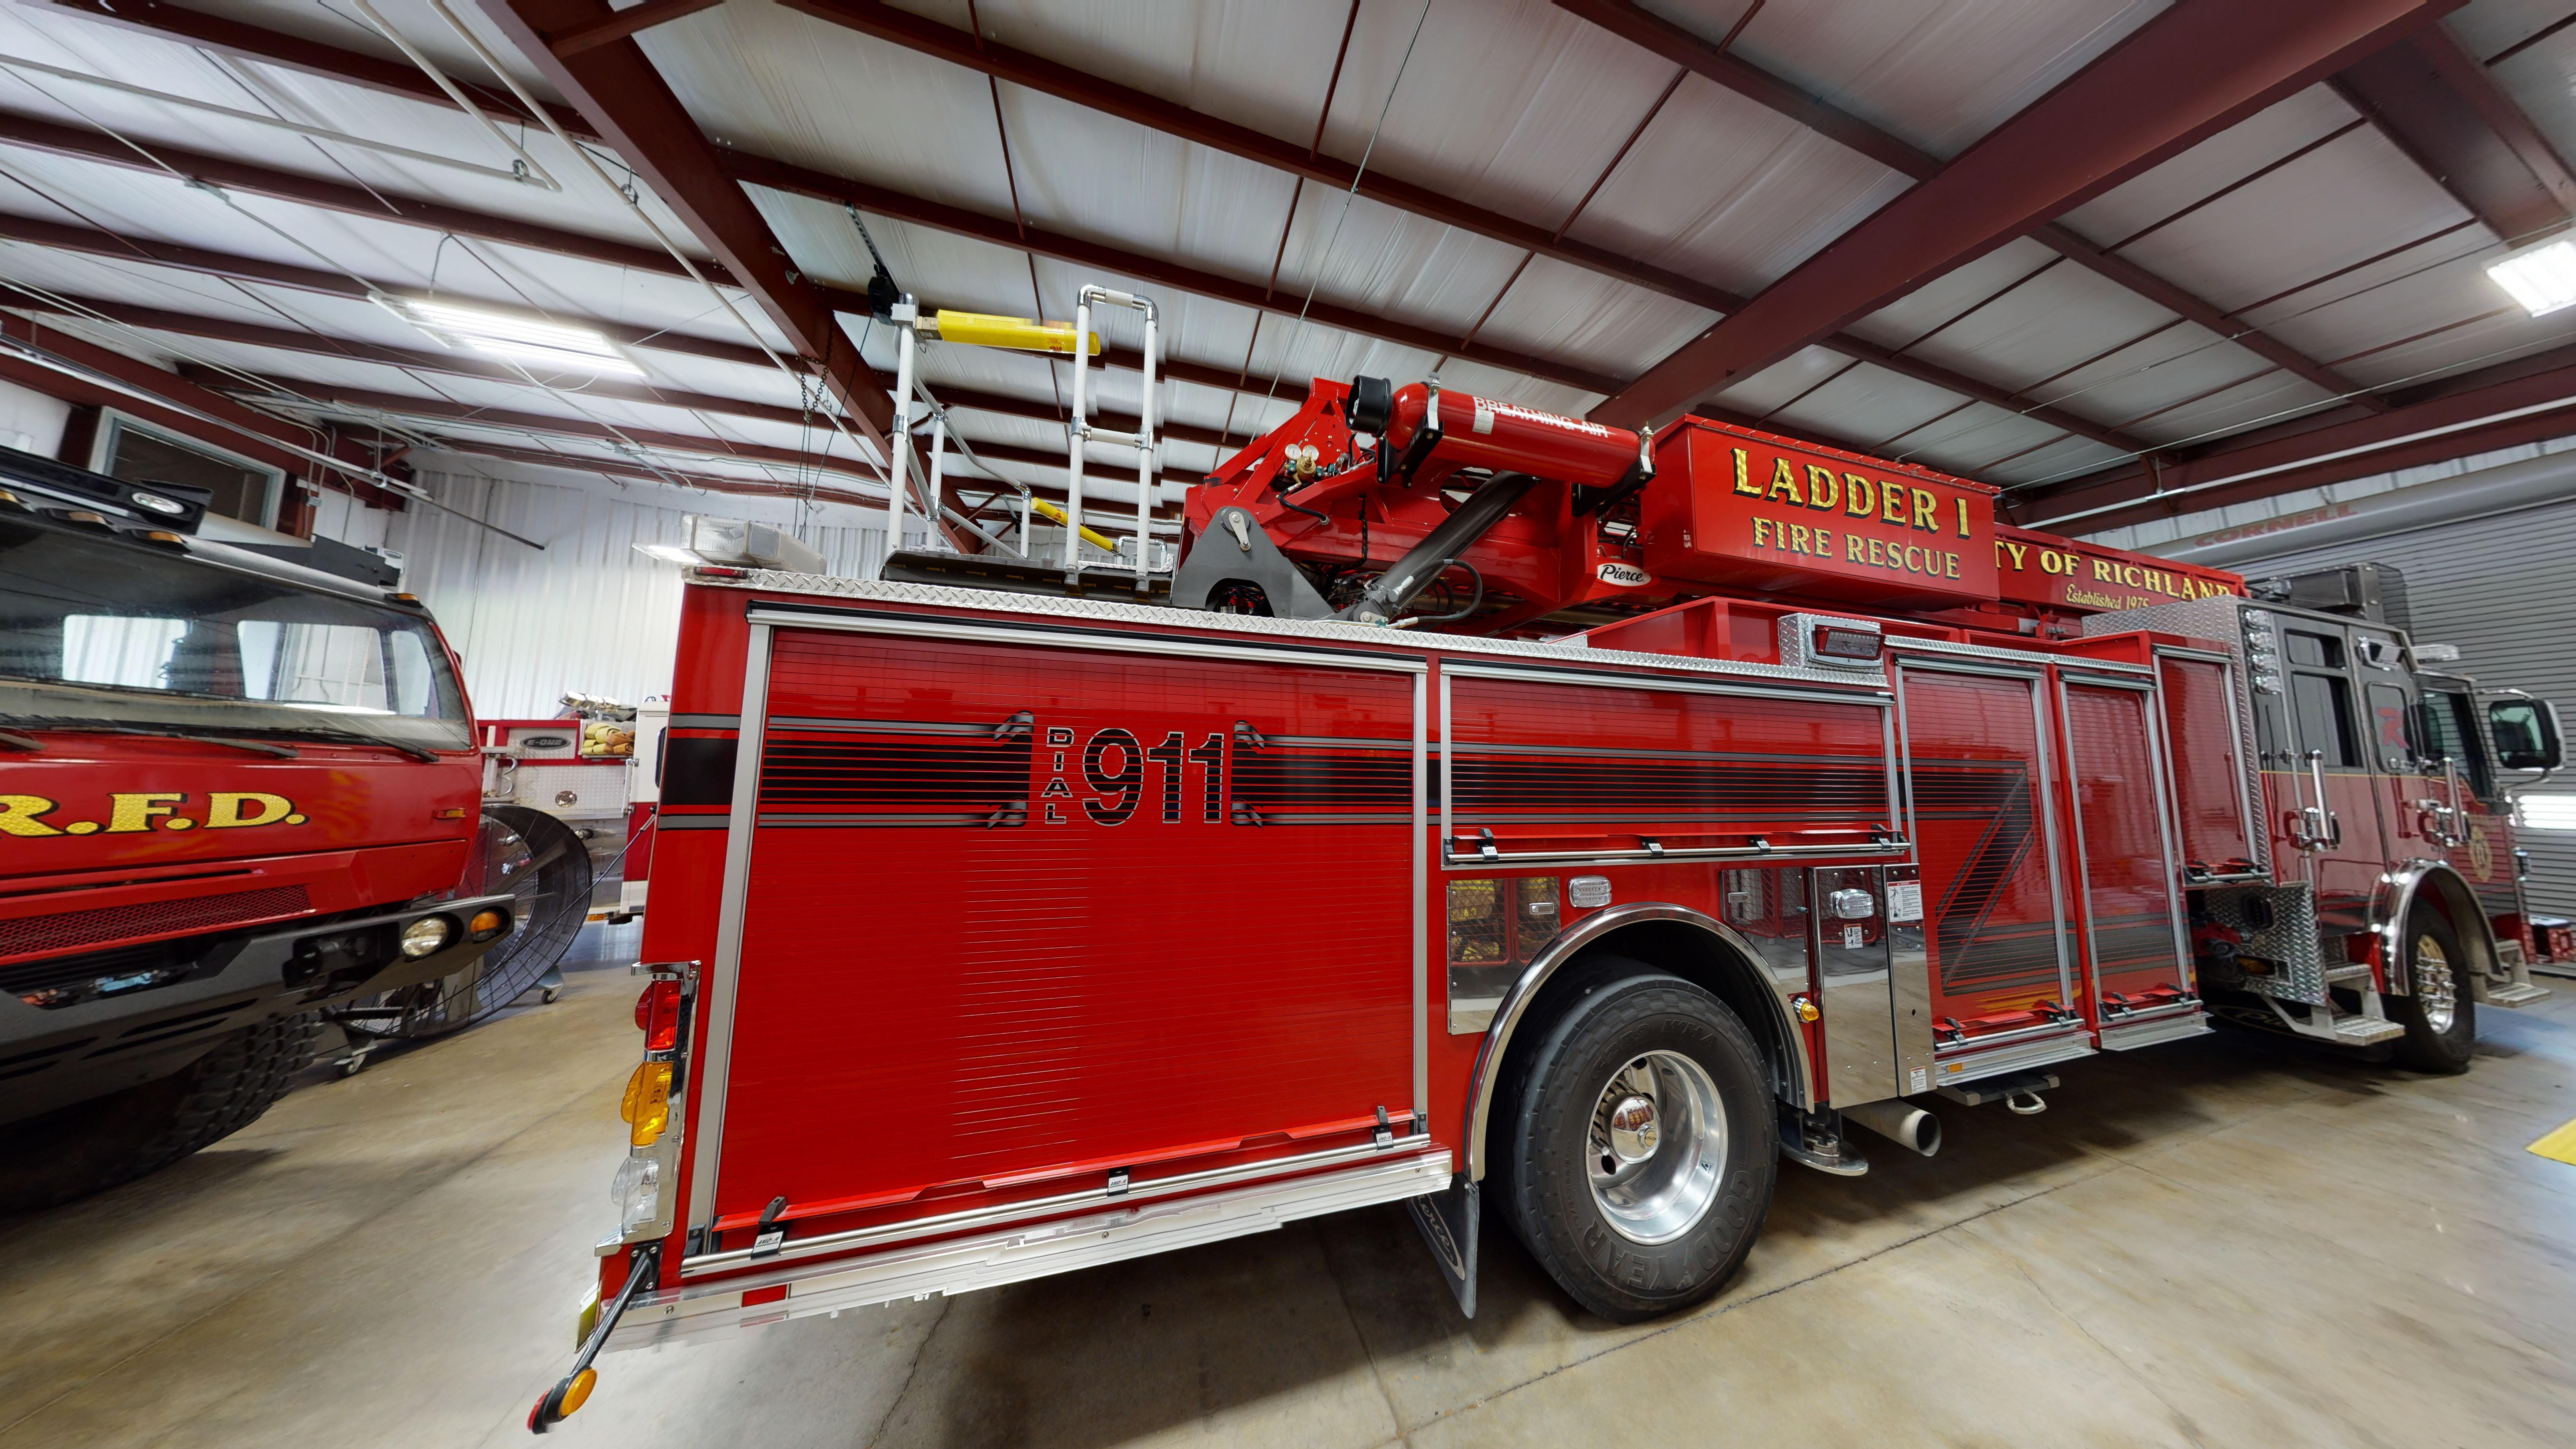 Richland-Fire-Dept-Ladder-1-07122021_153748